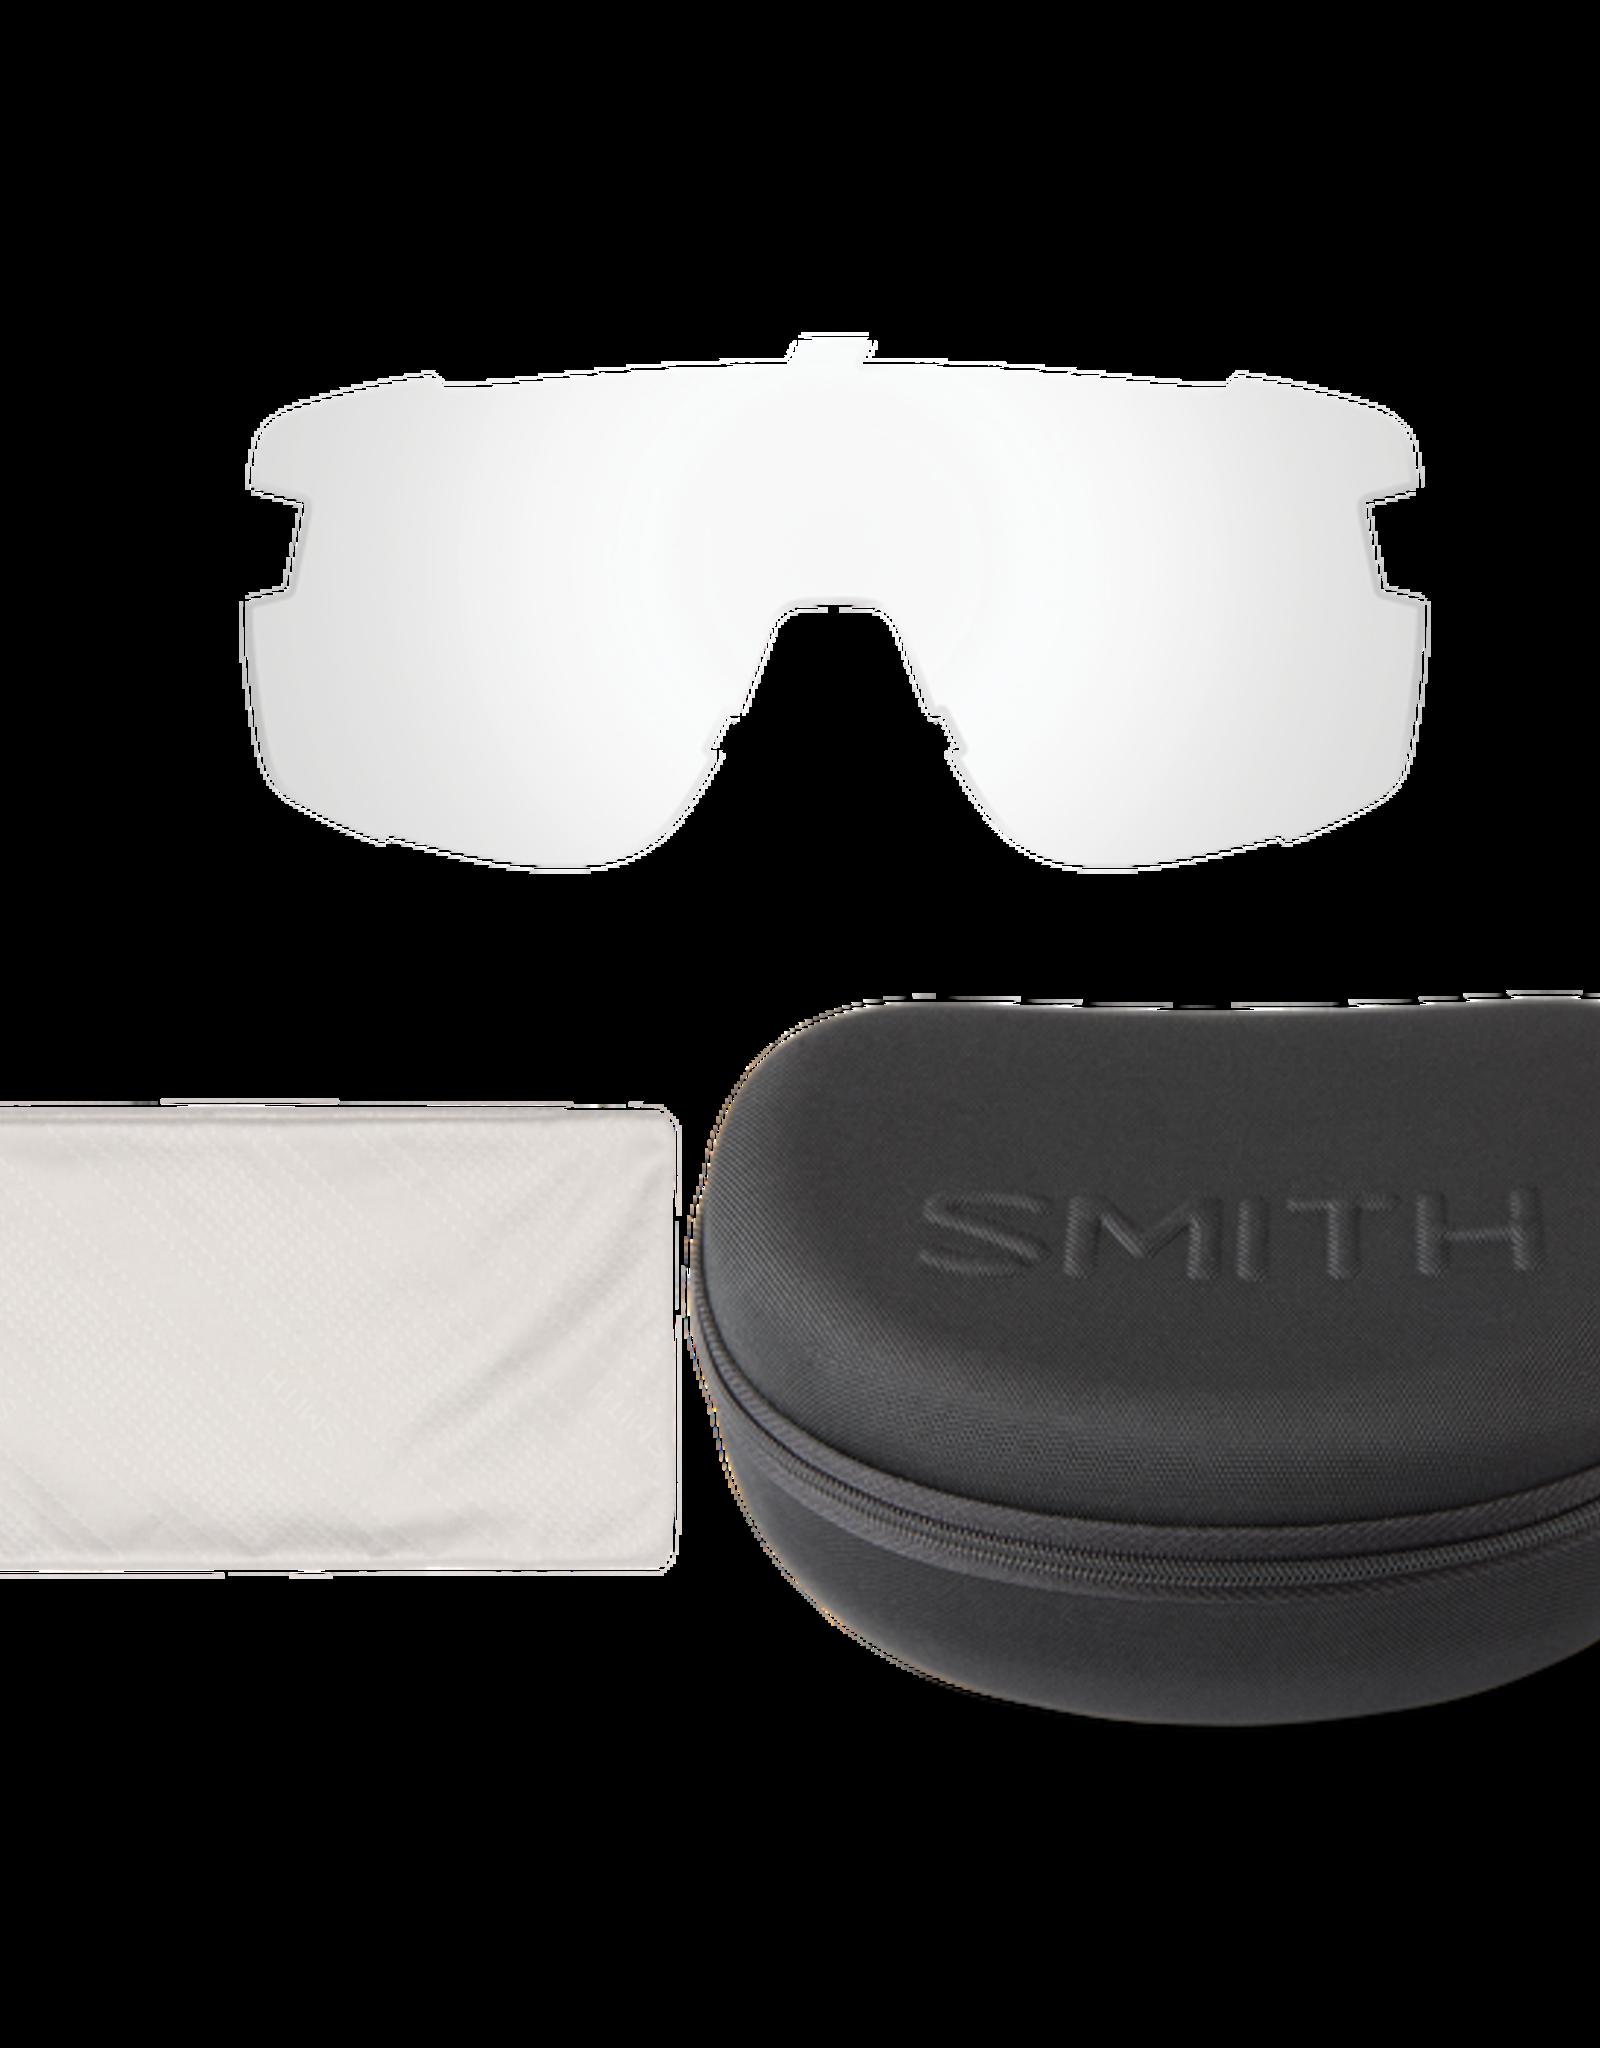 SMITH OPTICS SMITH Sunglasses WILDCAT Black Cinder ChromaPop Black/Clear